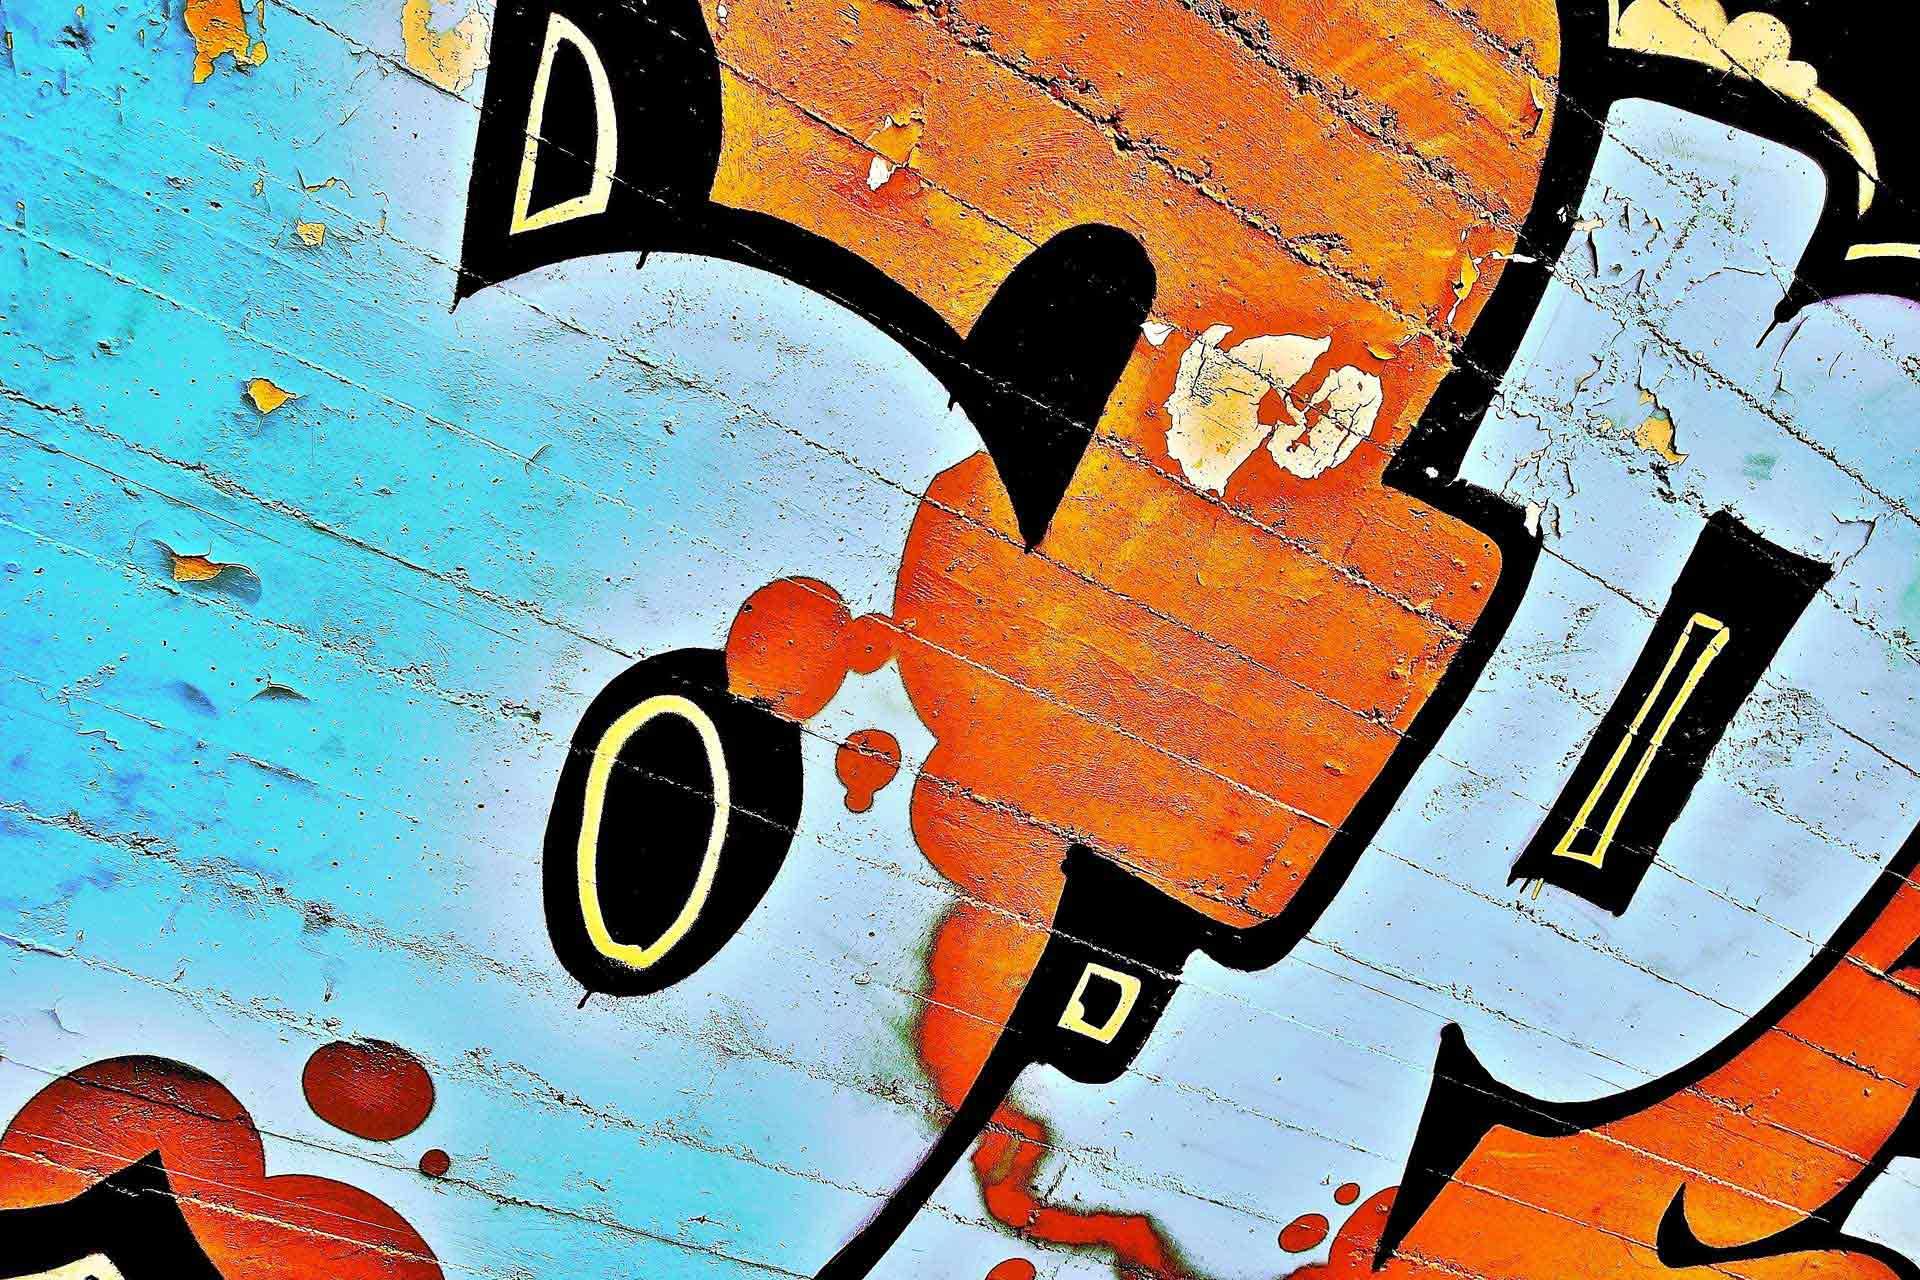 ubuntu precise pangolin wallpaper - photo #32